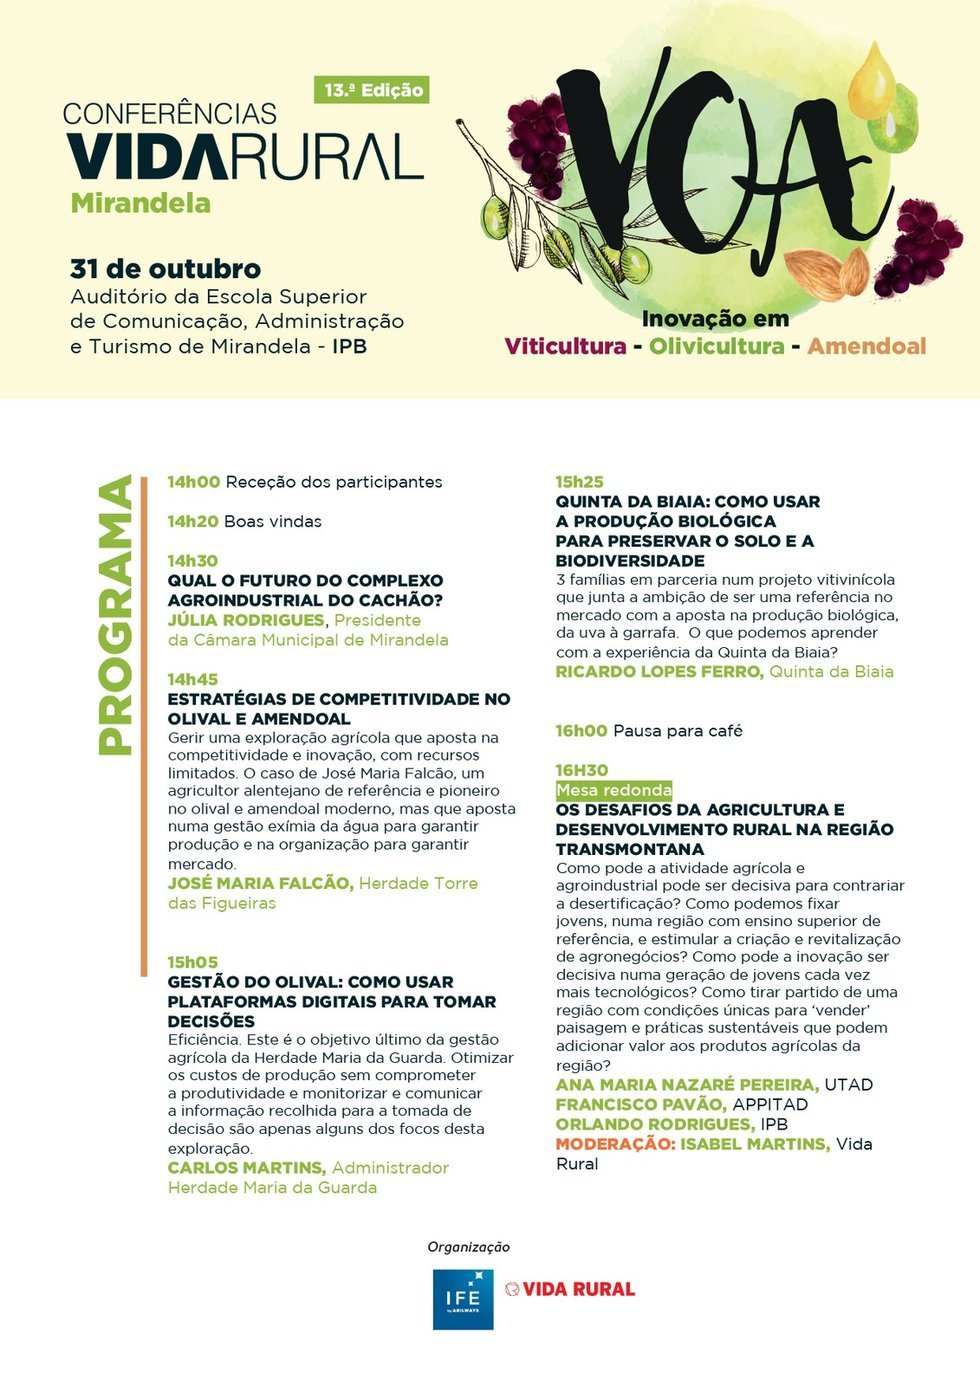 Conferência Vida Rural: Viticultura, ...